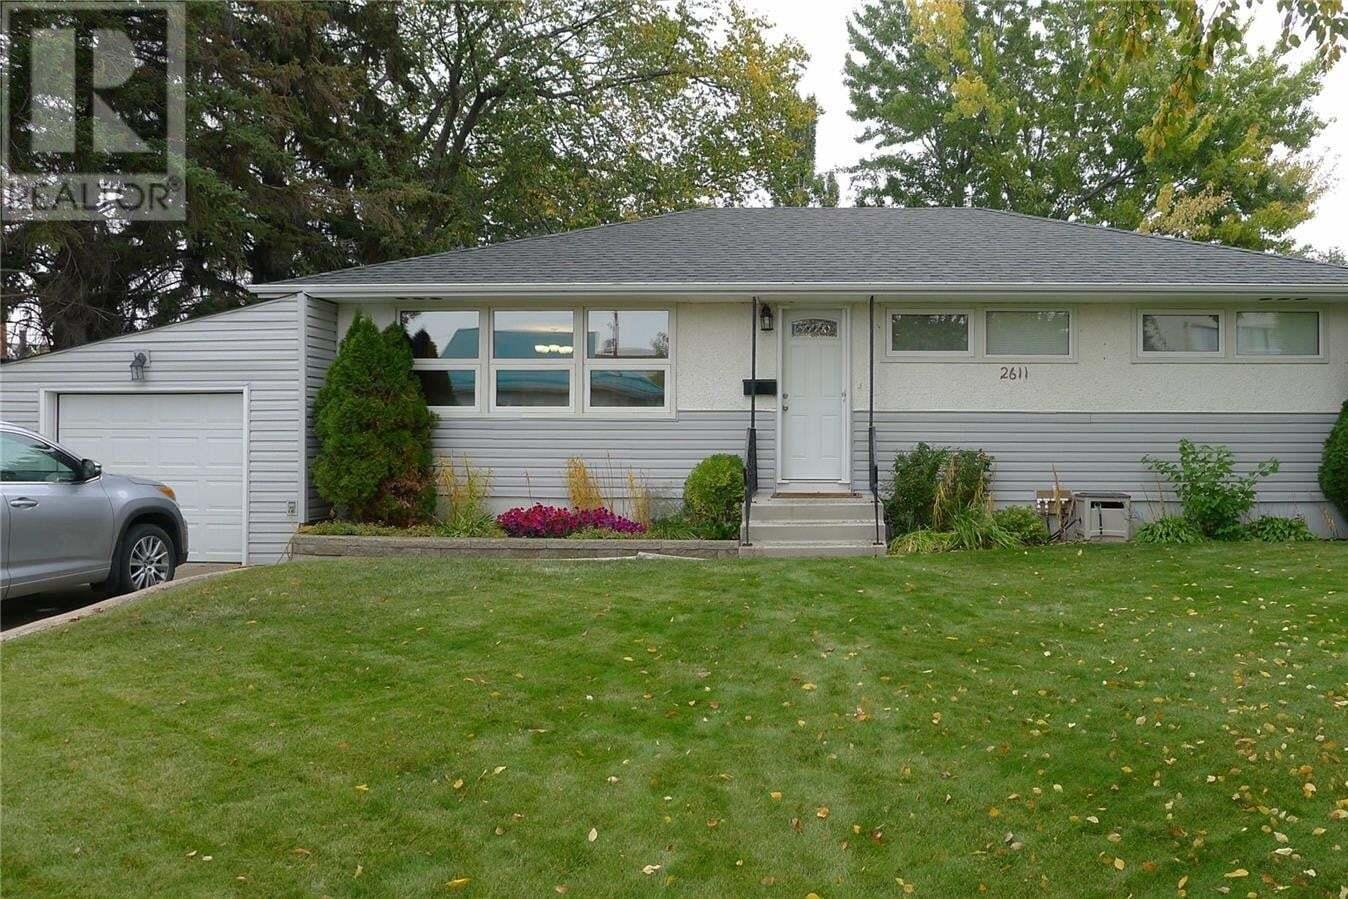 House for sale at 2611 Dufferin Ave Saskatoon Saskatchewan - MLS: SK828004